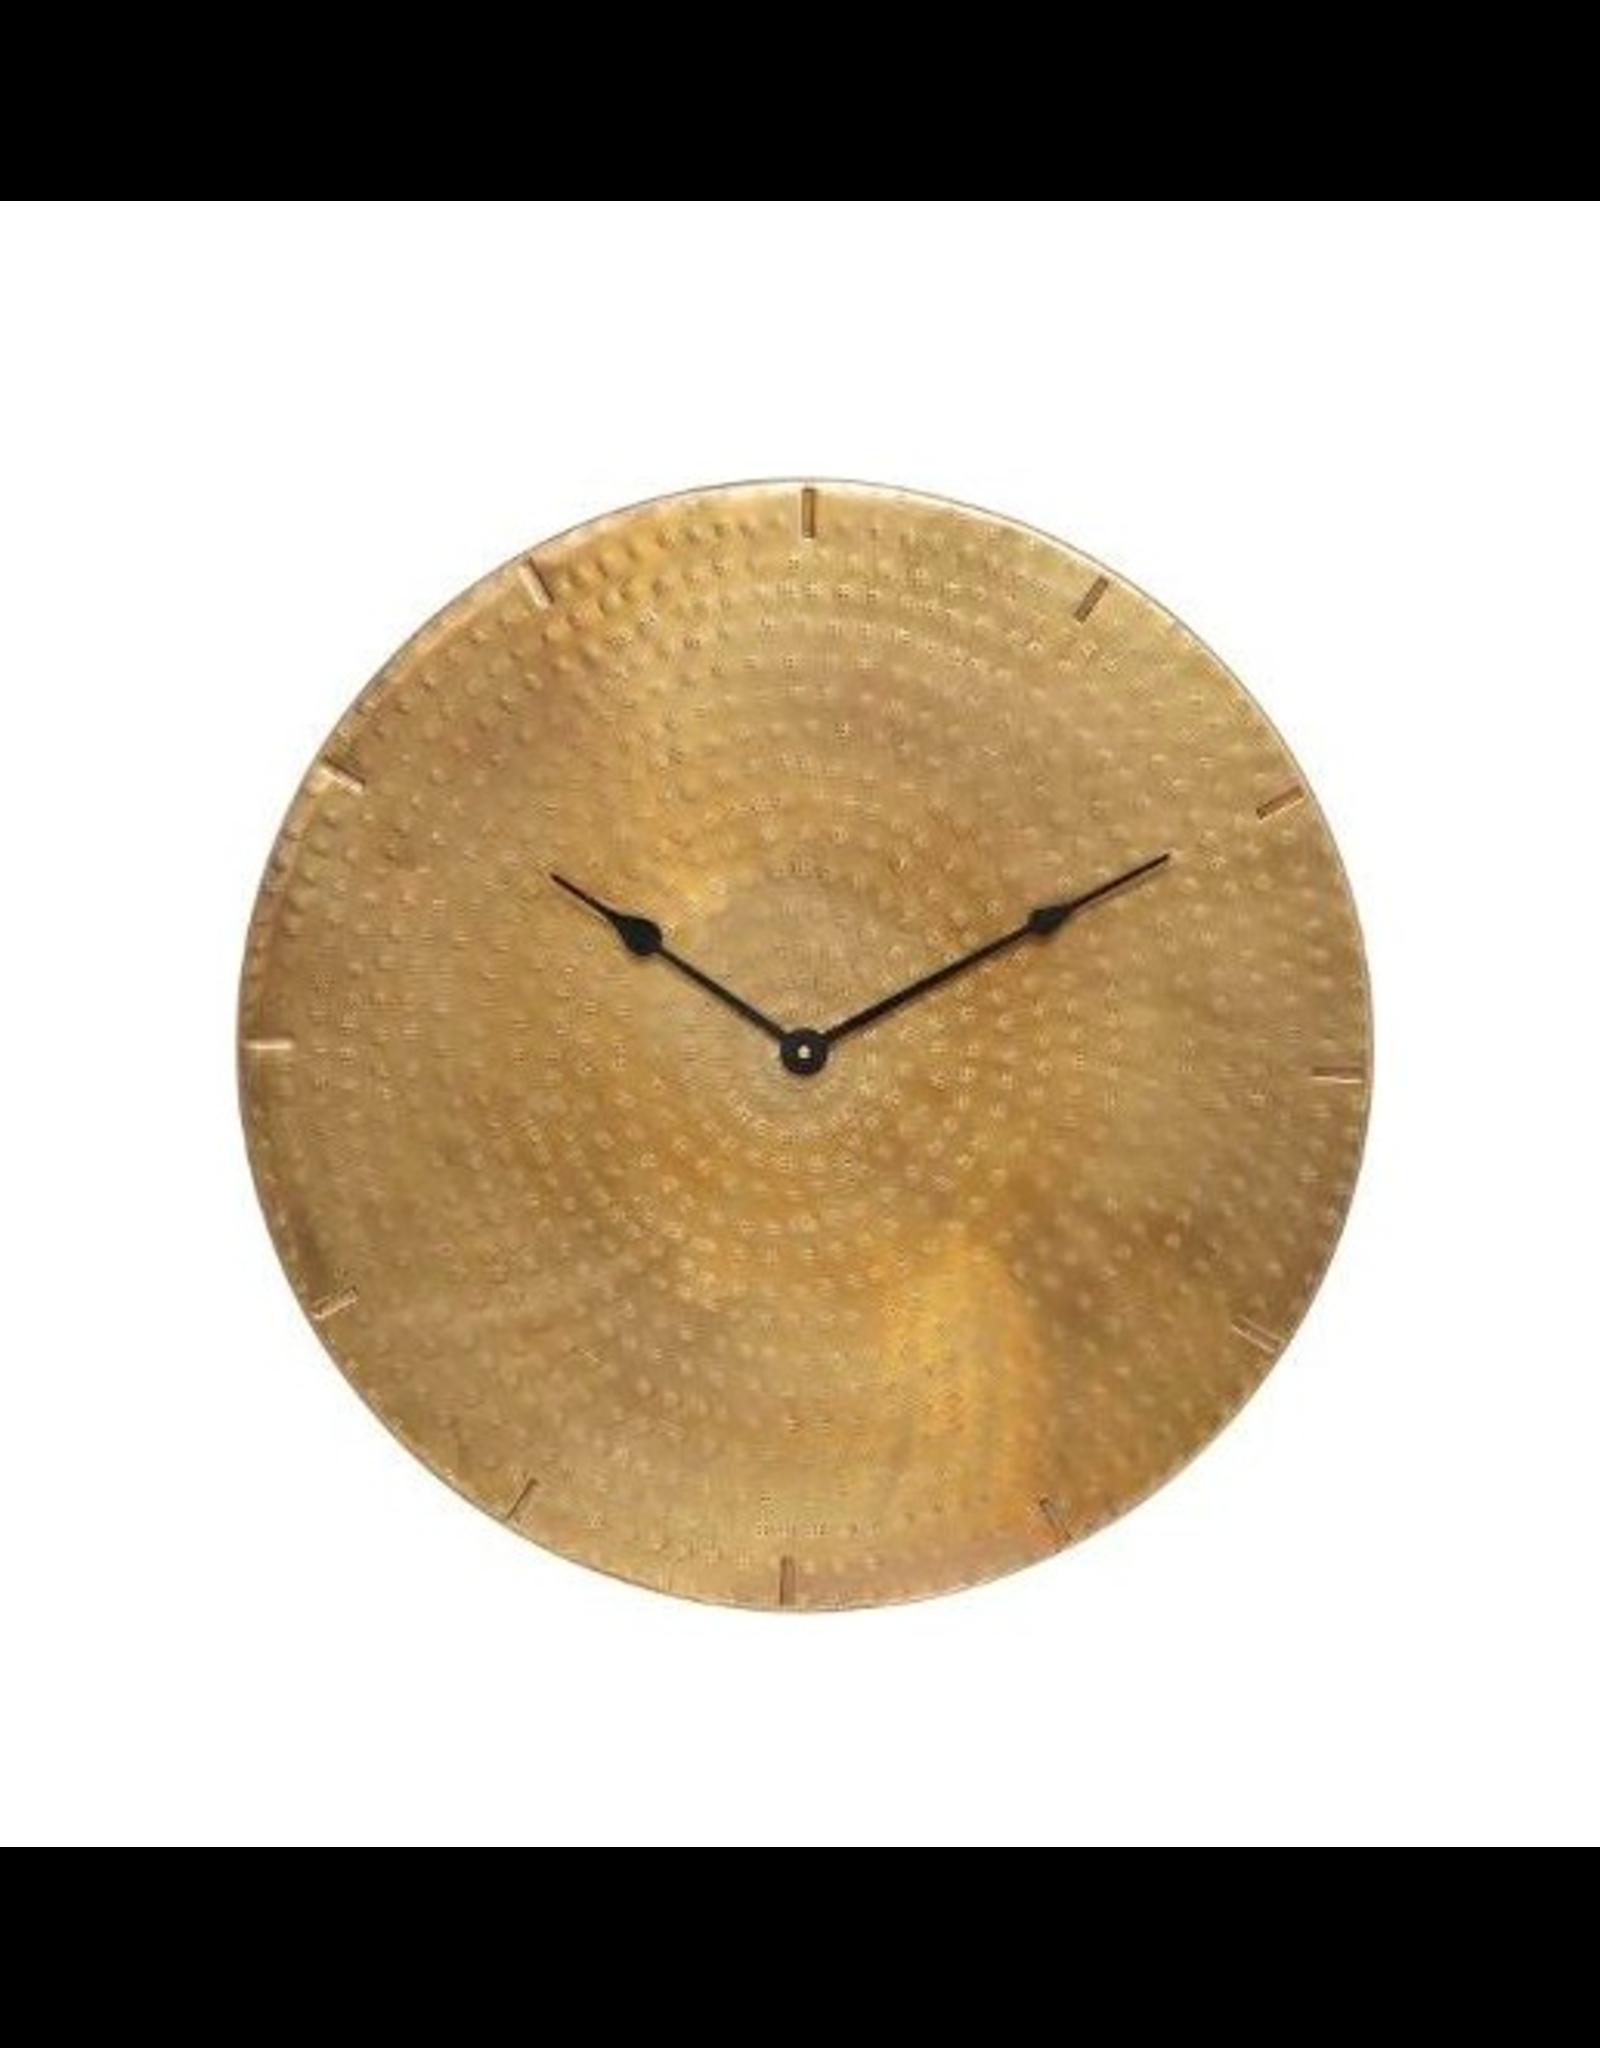 LOFT030 Wandklok XL metaal kleur goud diameter 49 cm